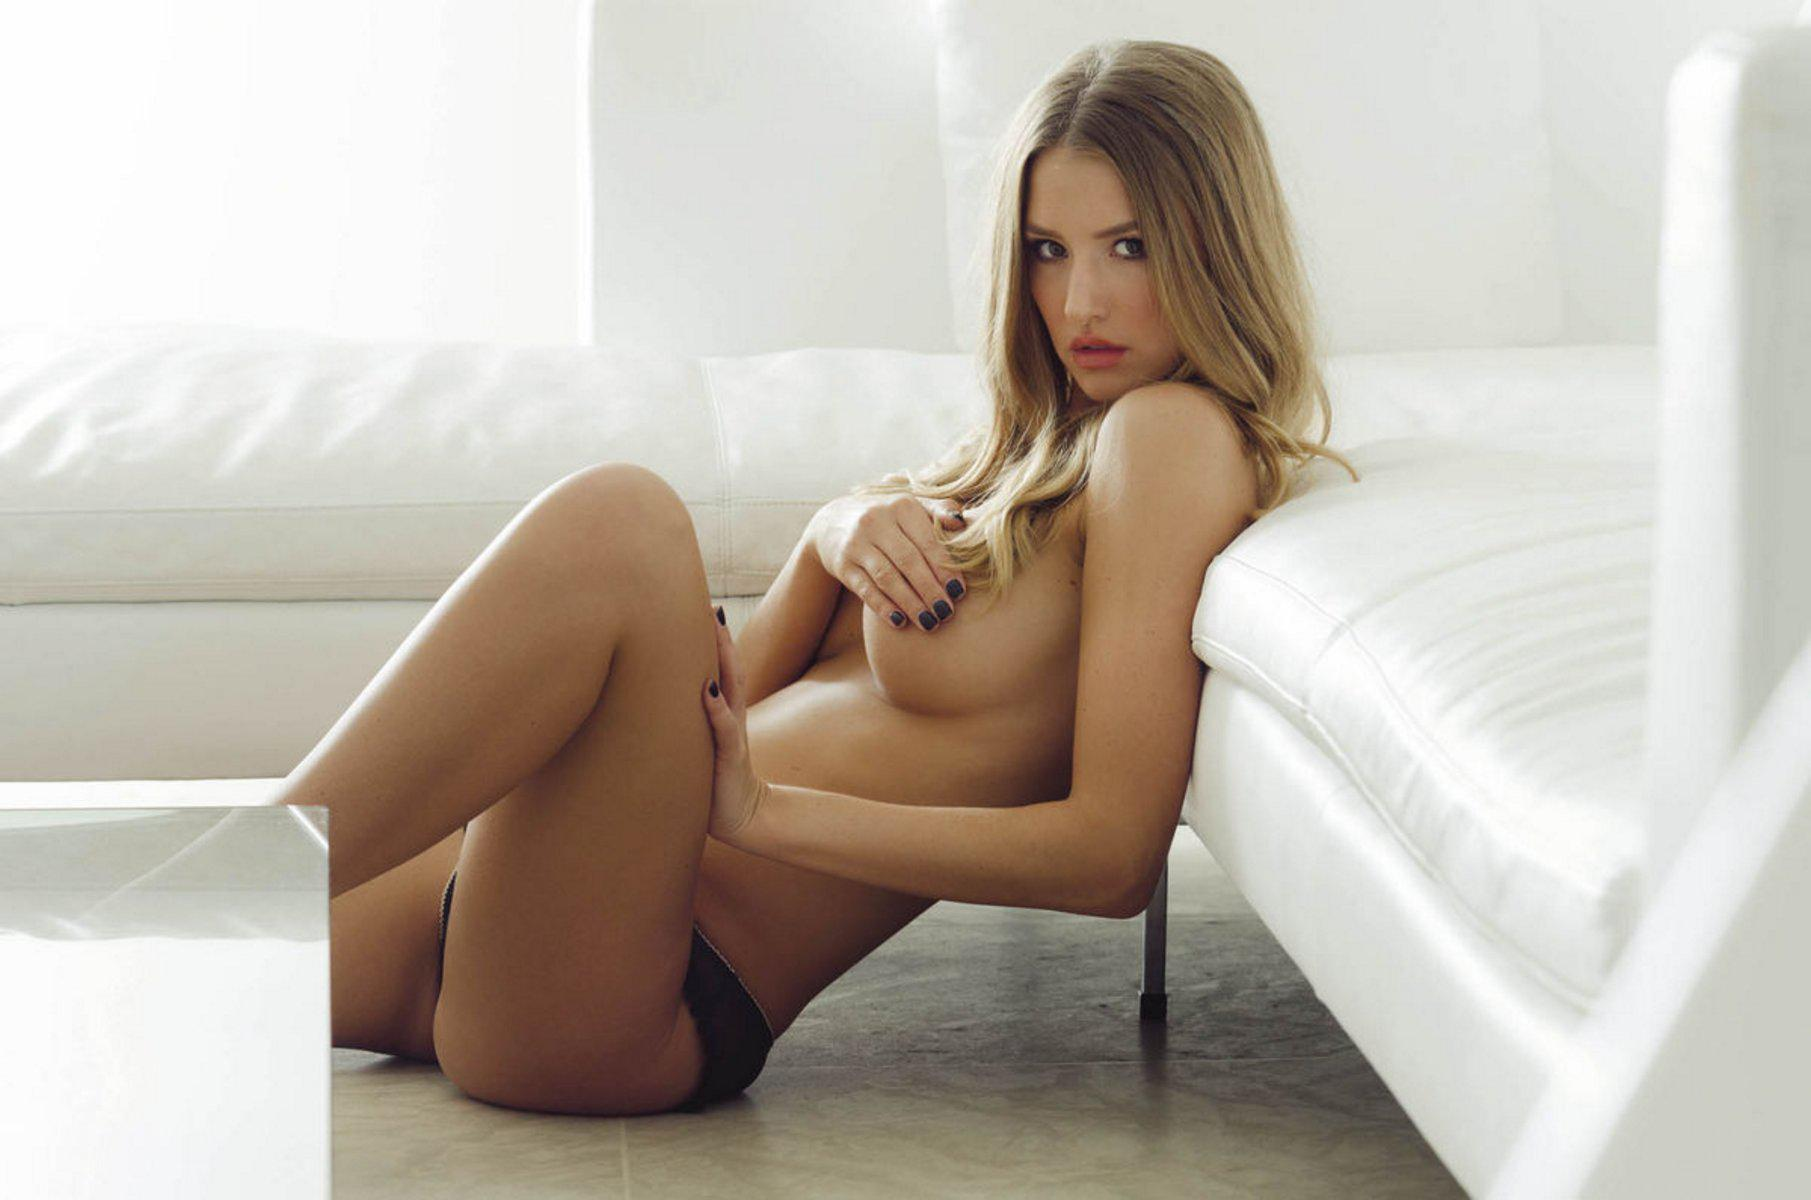 Danica thrall naked girls